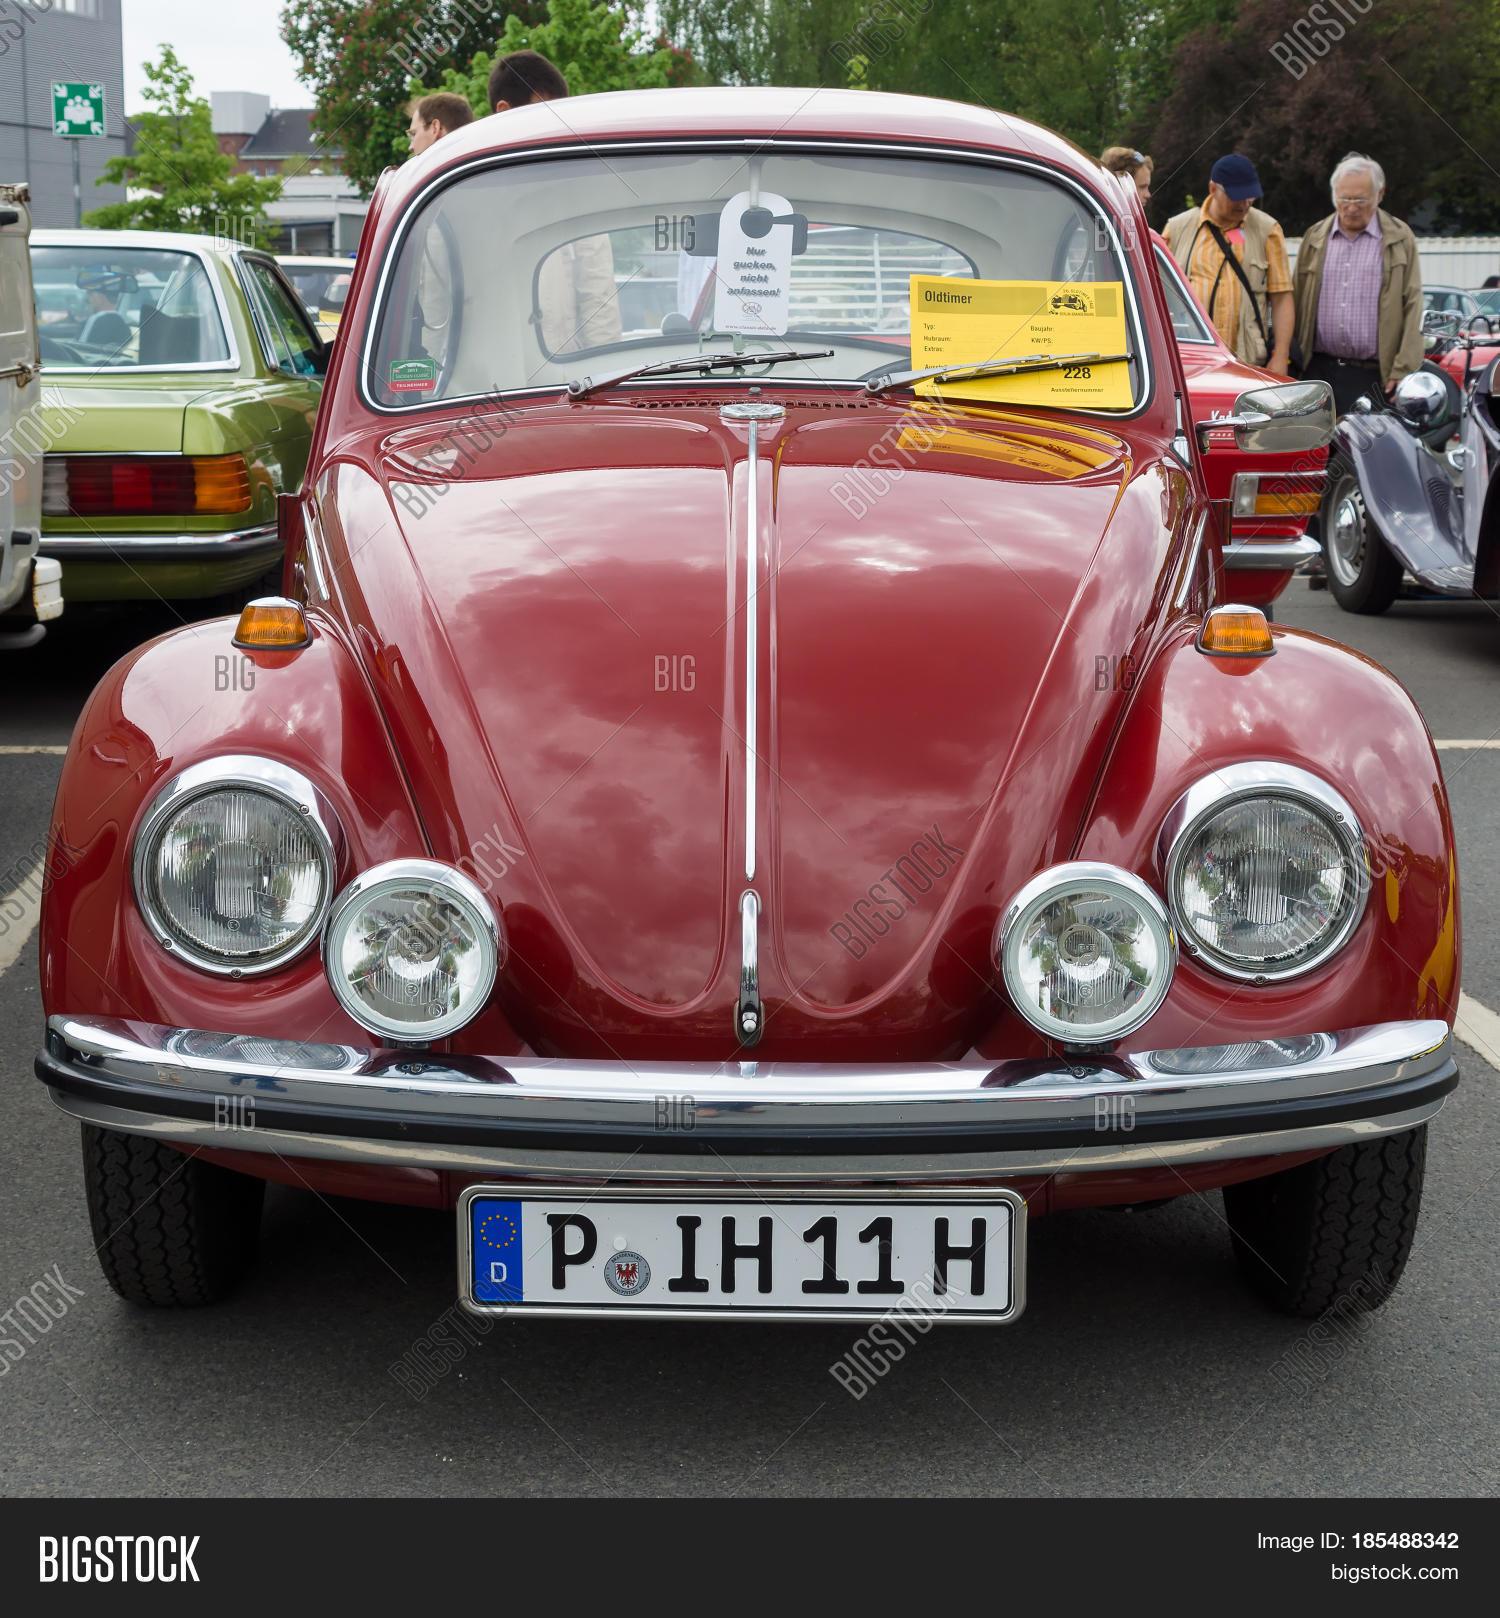 berlin may 11 car volkswagen image photo bigstock. Black Bedroom Furniture Sets. Home Design Ideas